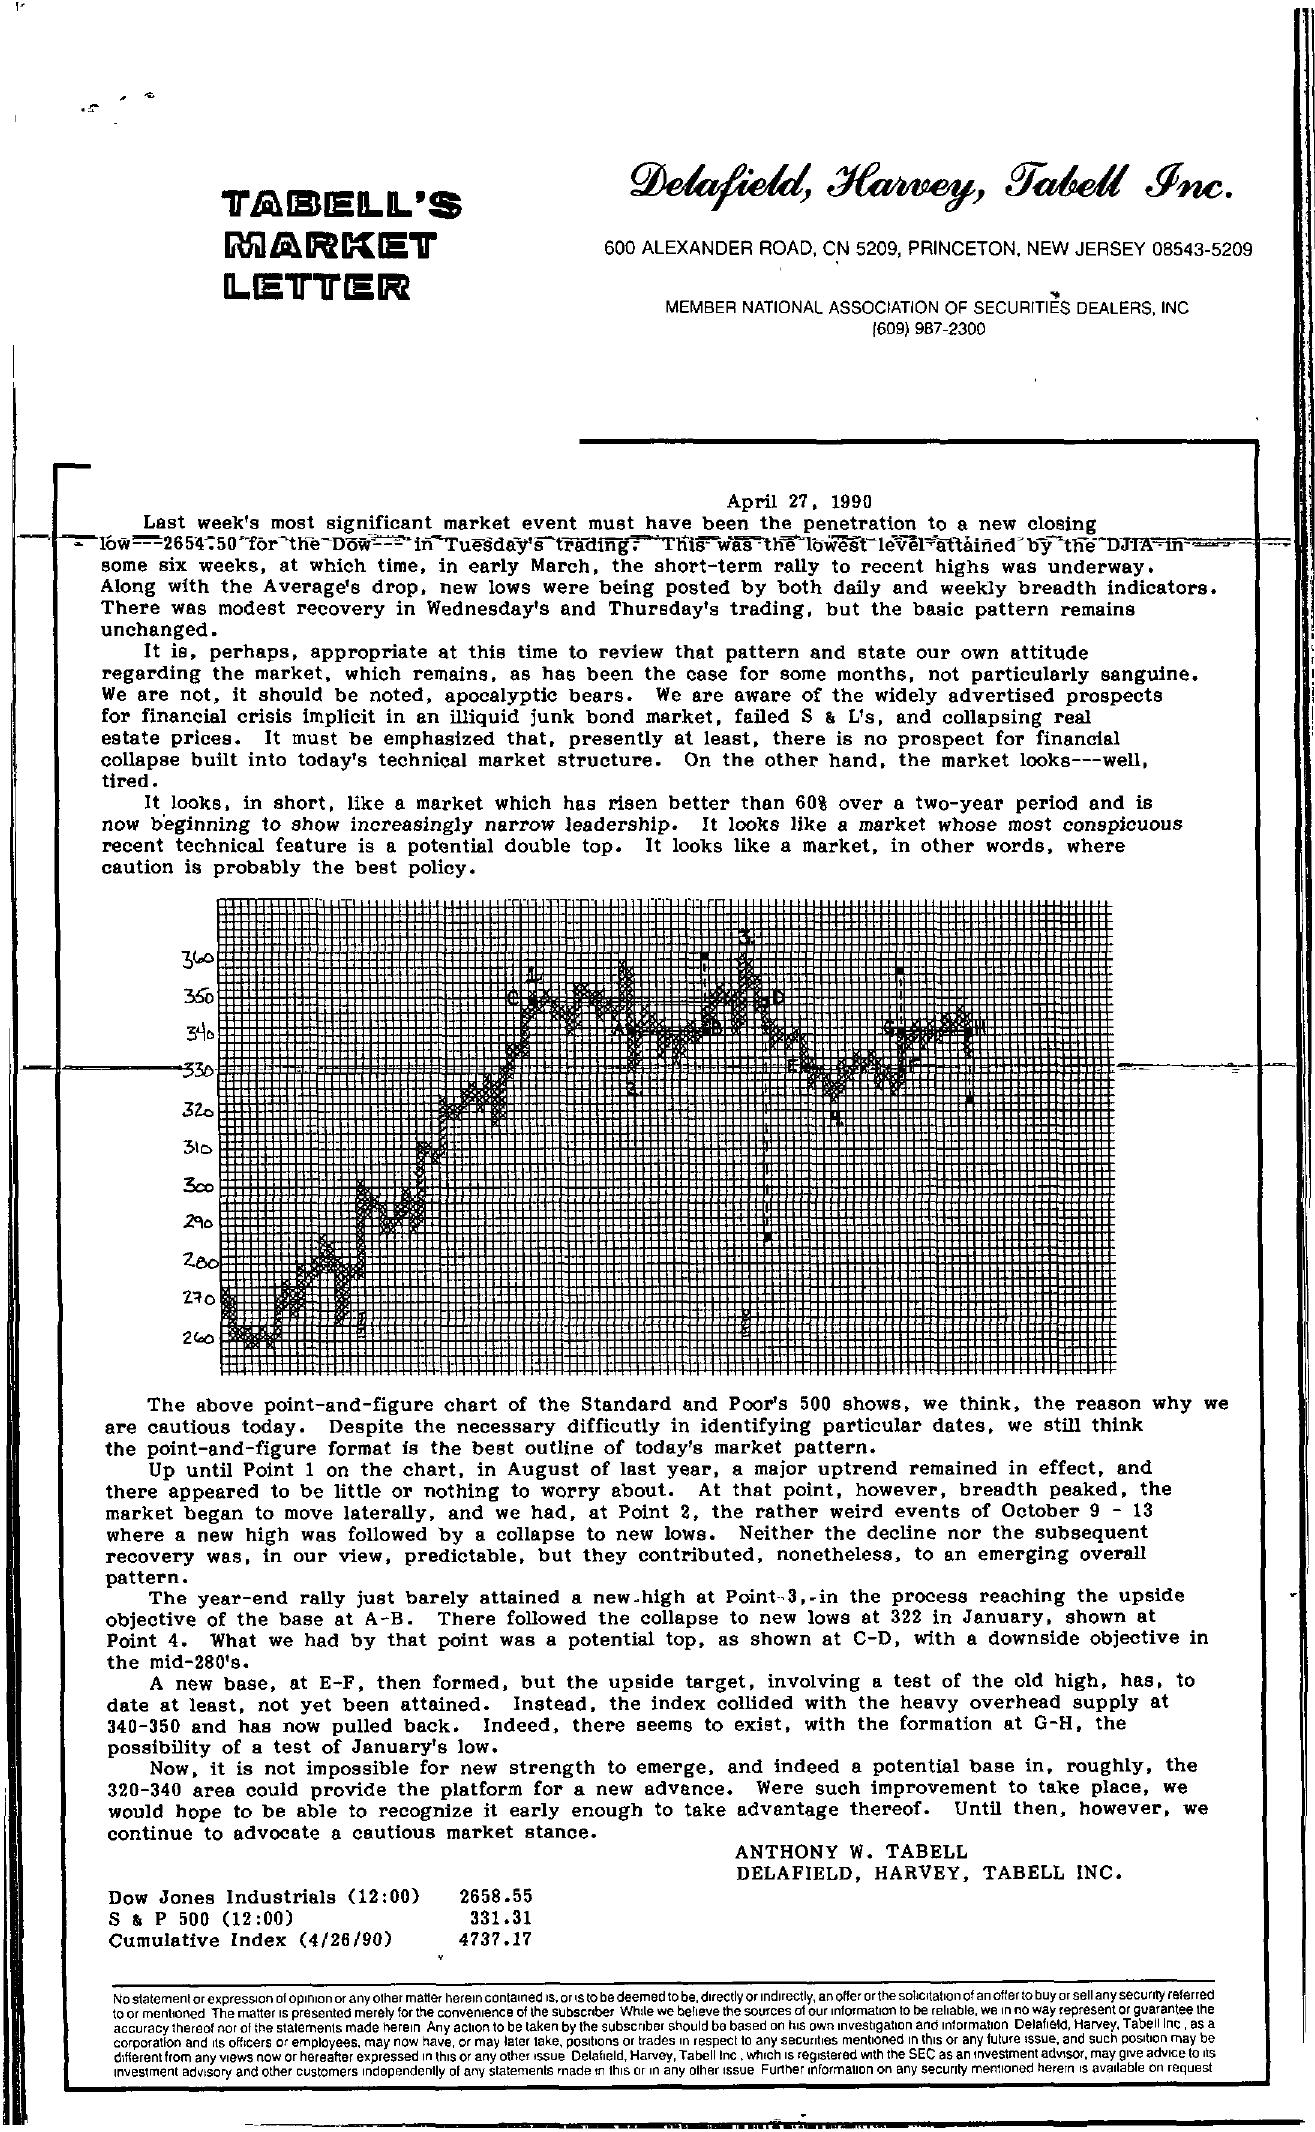 Tabell's Market Letter - April 27, 1990